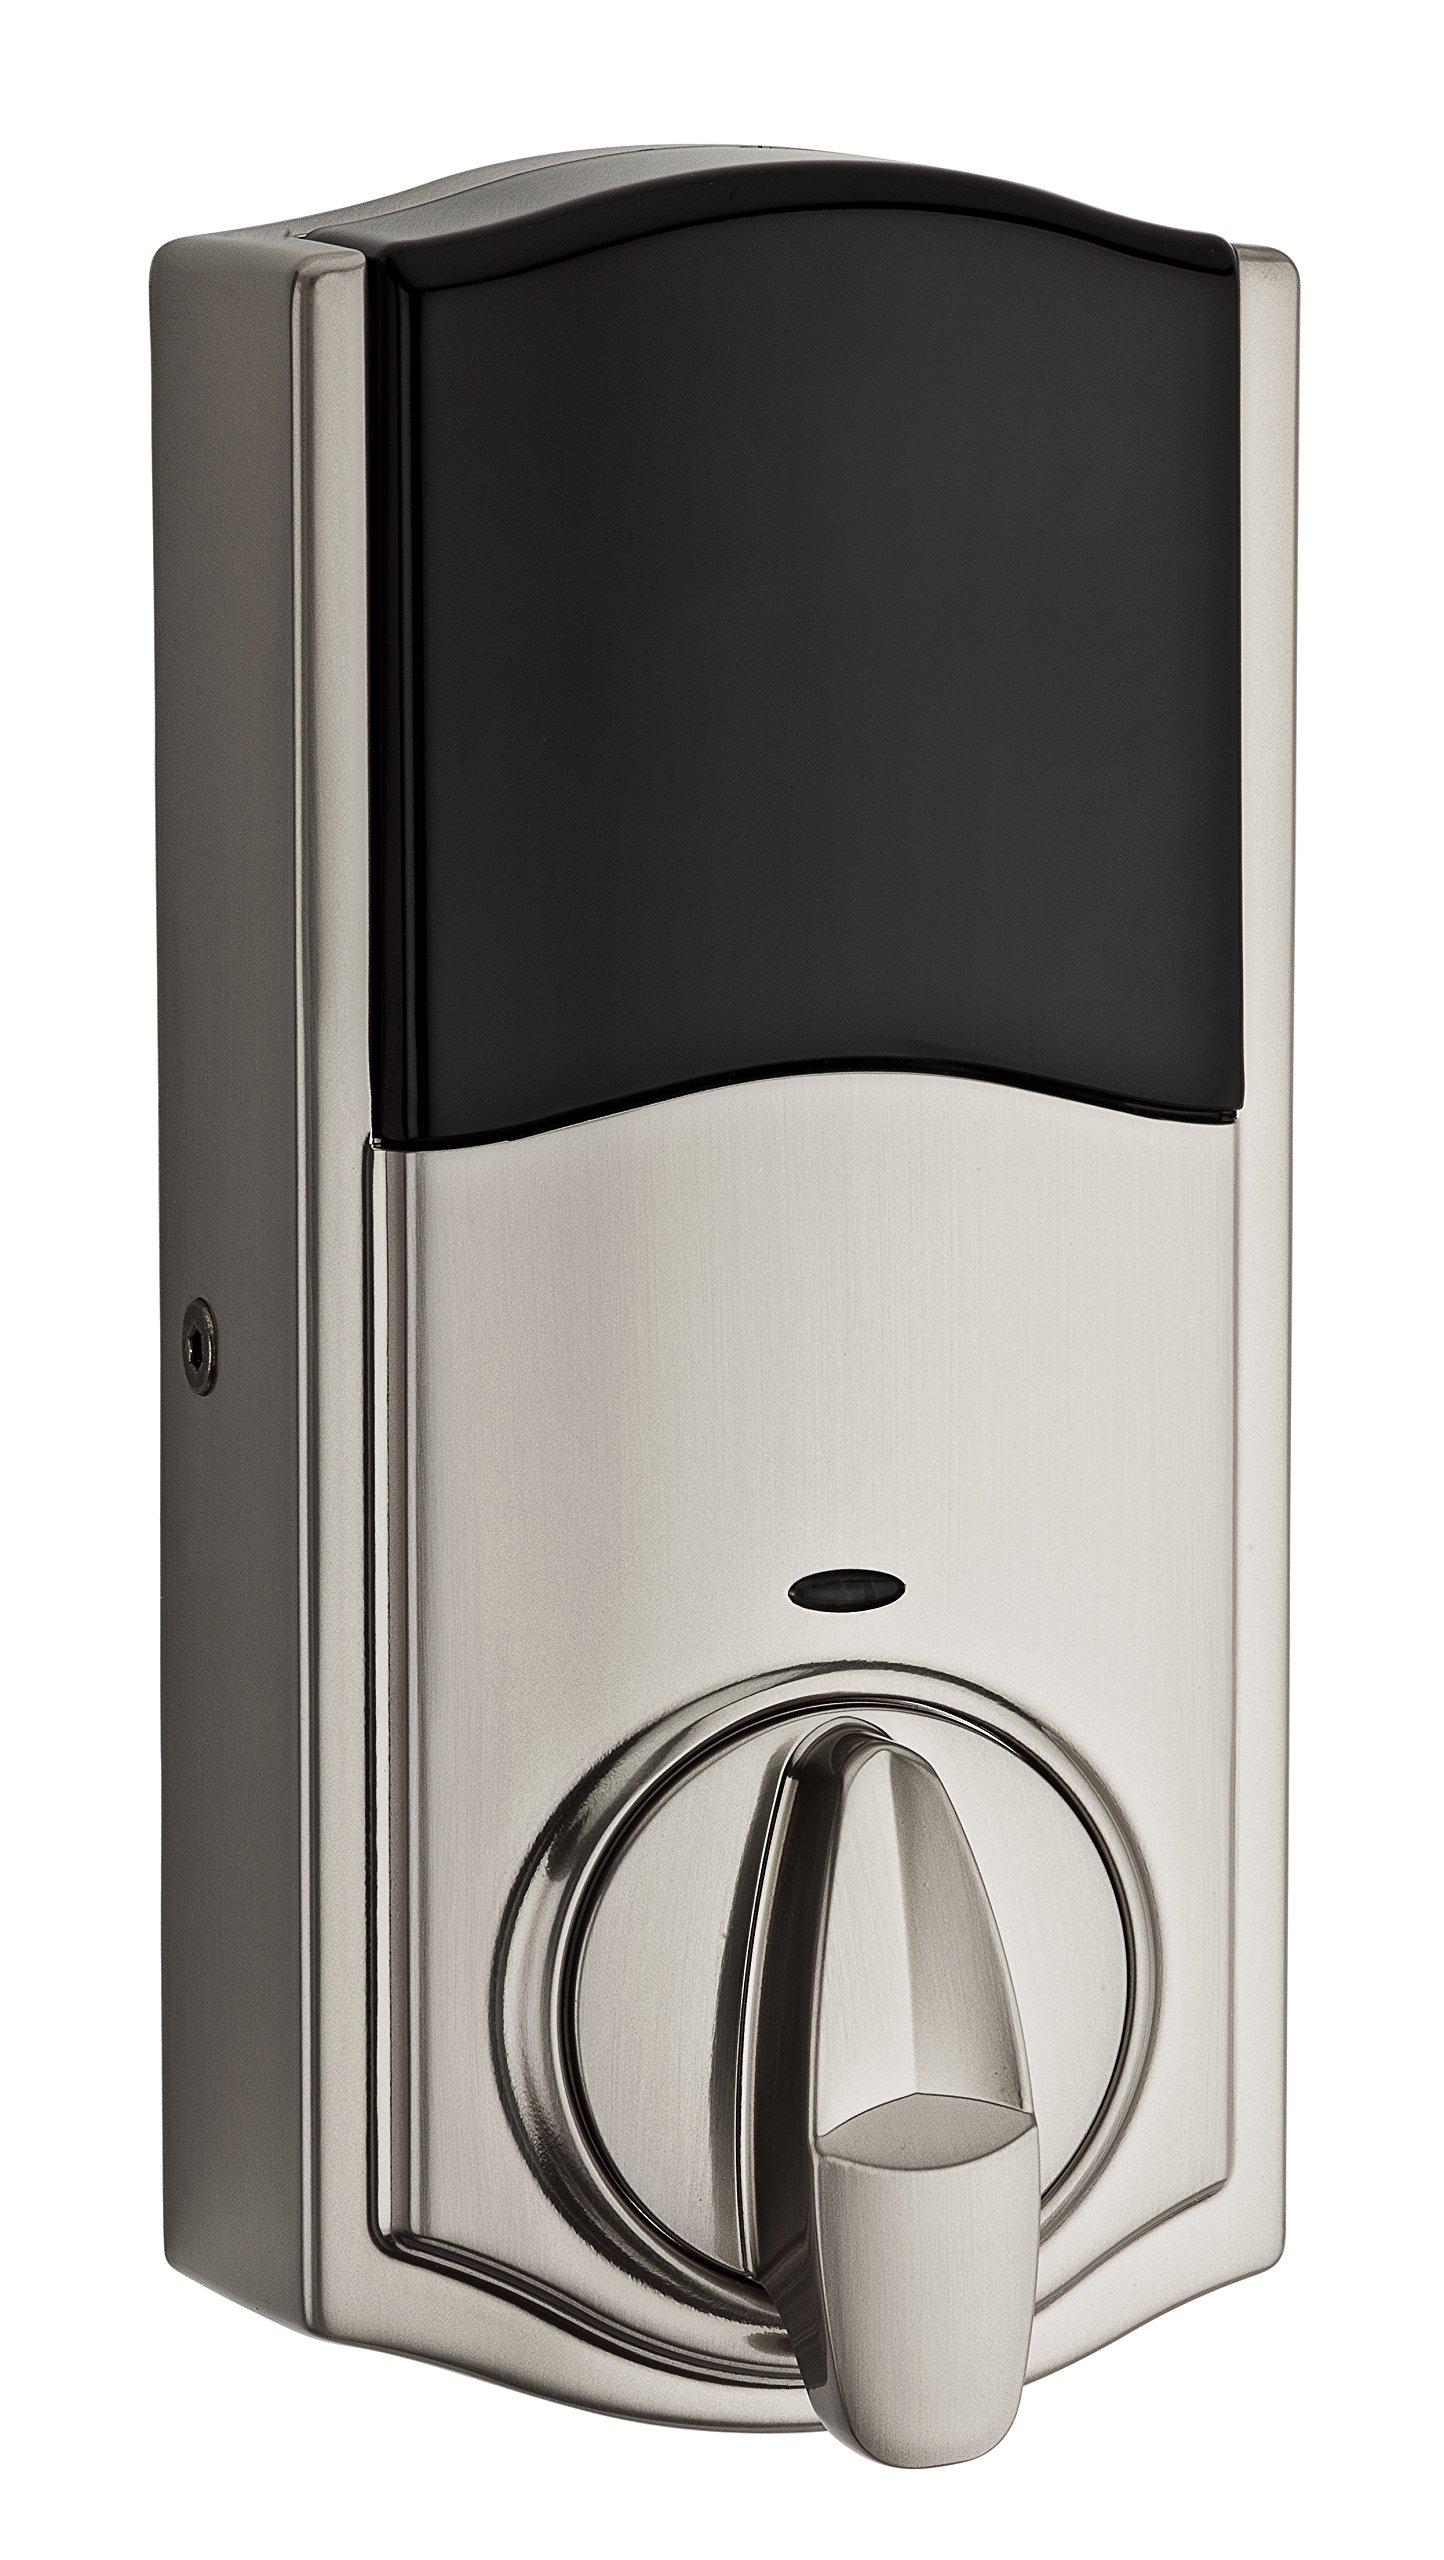 Kwikset 916 Z-Wave SmartCode Touchscreen Electronic Deadbolt, Works with Amazon Alexa via SmartThings, Wink, or Iris featuring SmartKey in Satin Nickel by Kwikset (Image #2)